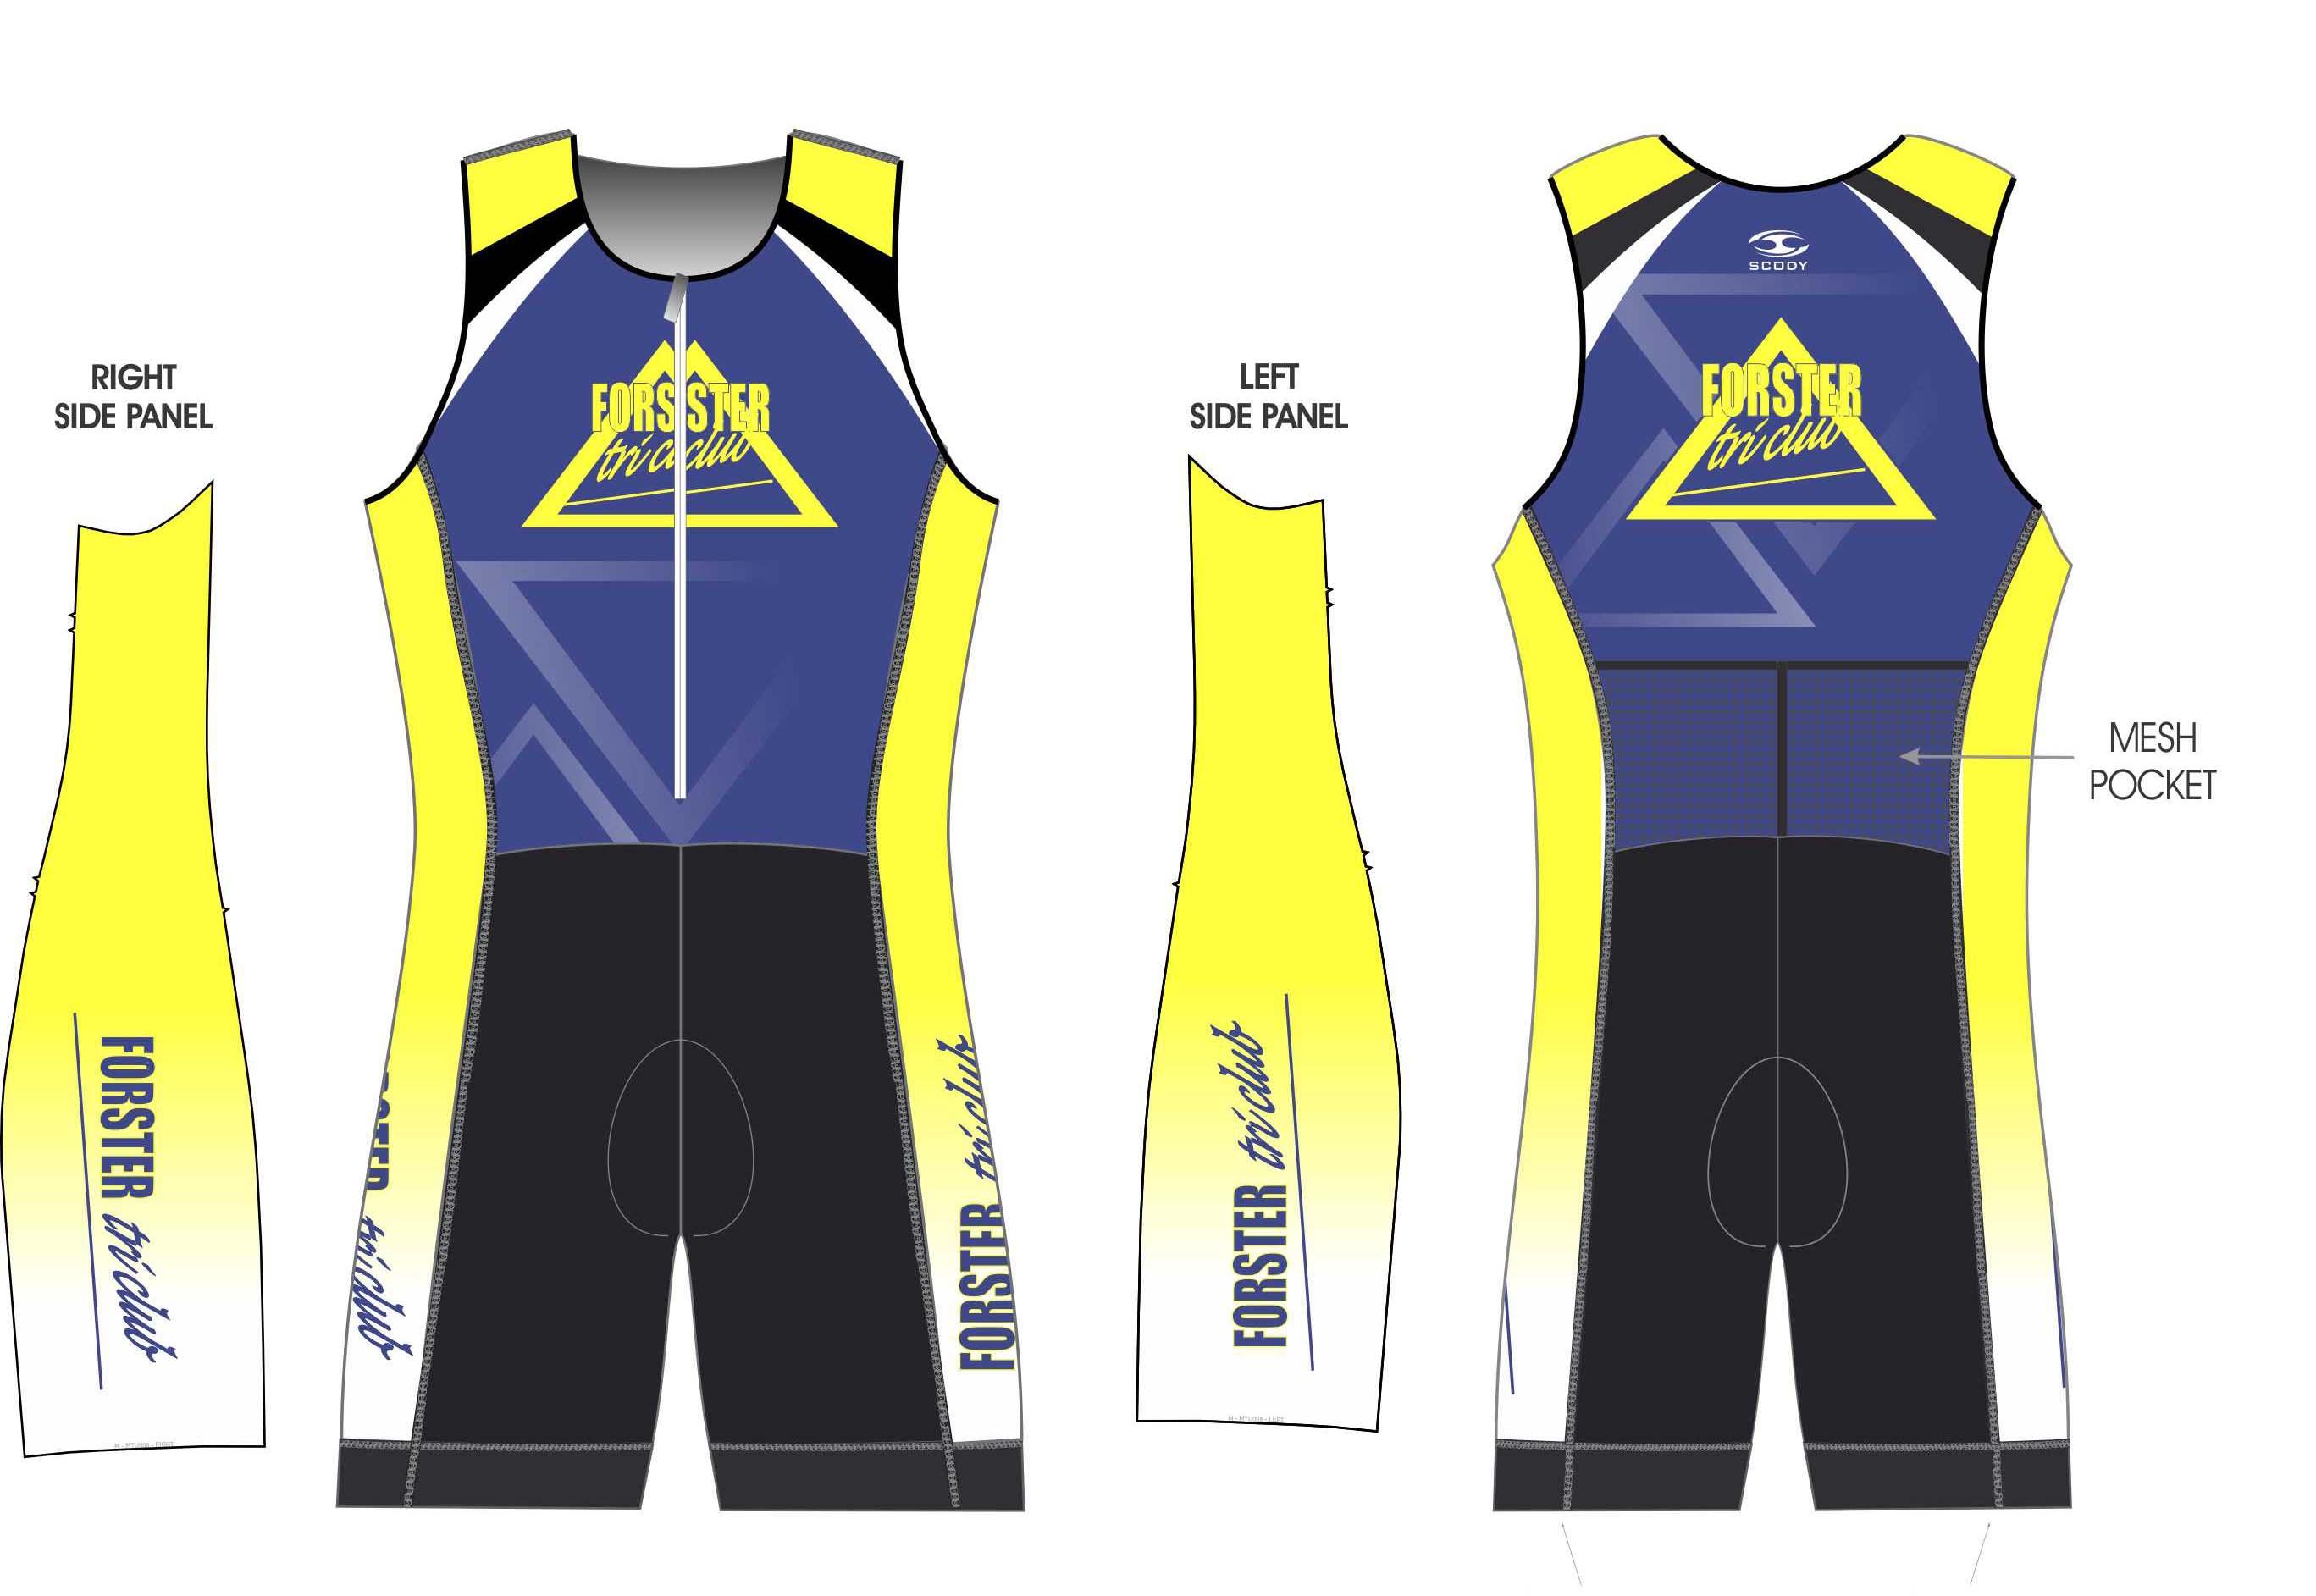 e34990f60 Welcome – Forster Triathlon Club